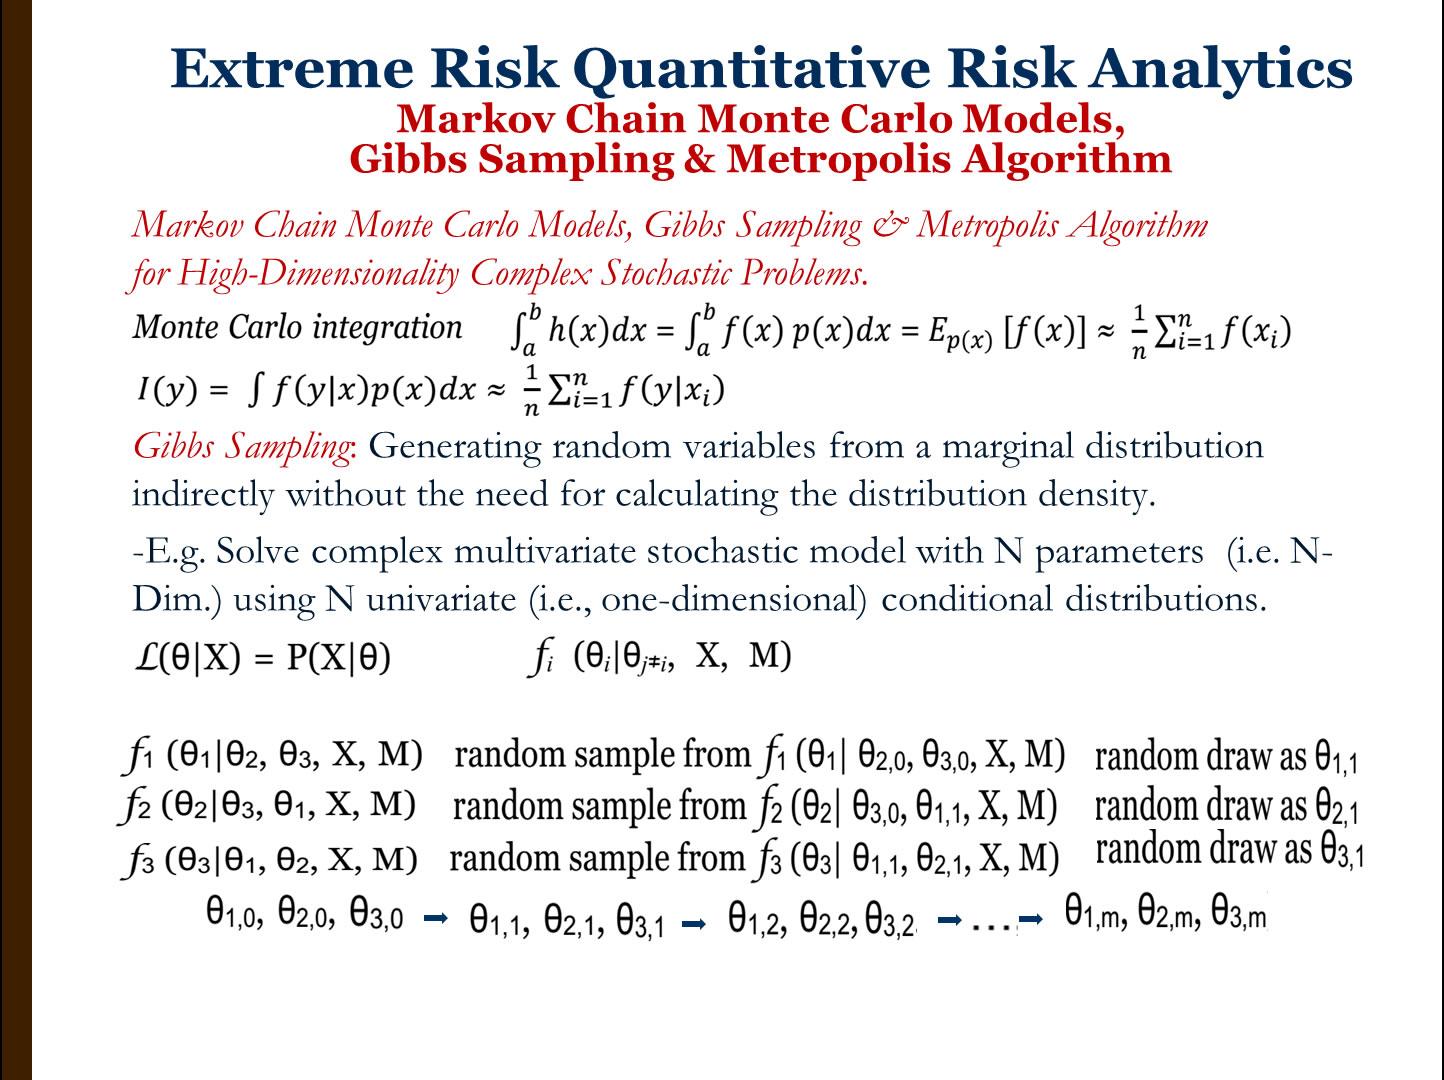 Markov Chain Monte Carlo Models, Gibbs Sampling, and, Metropolis-Hastings Algorithms